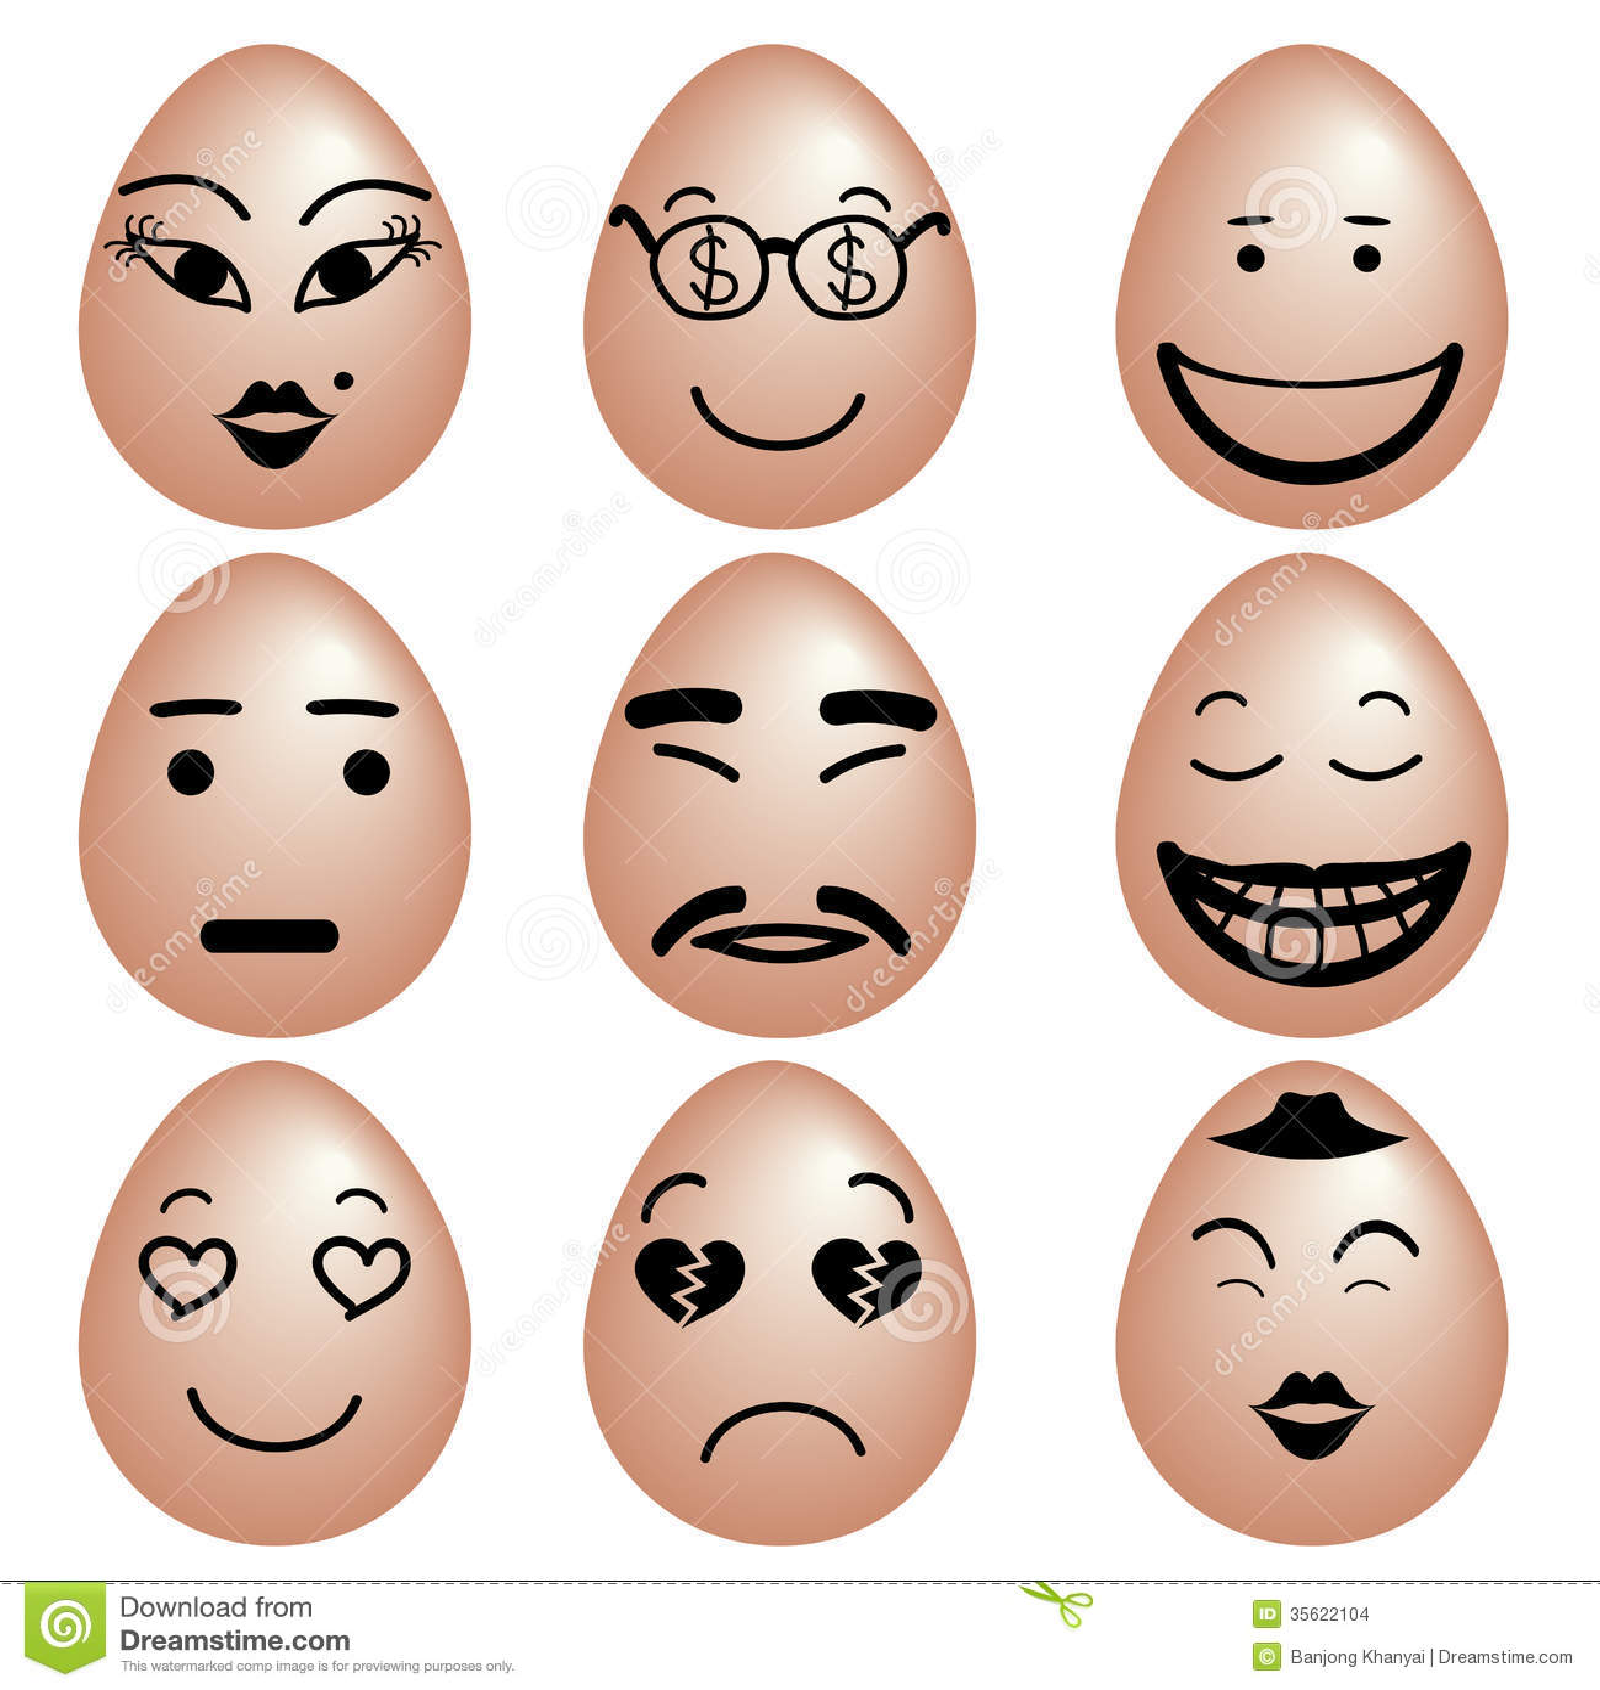 funny eggs emotion mood - photo #12